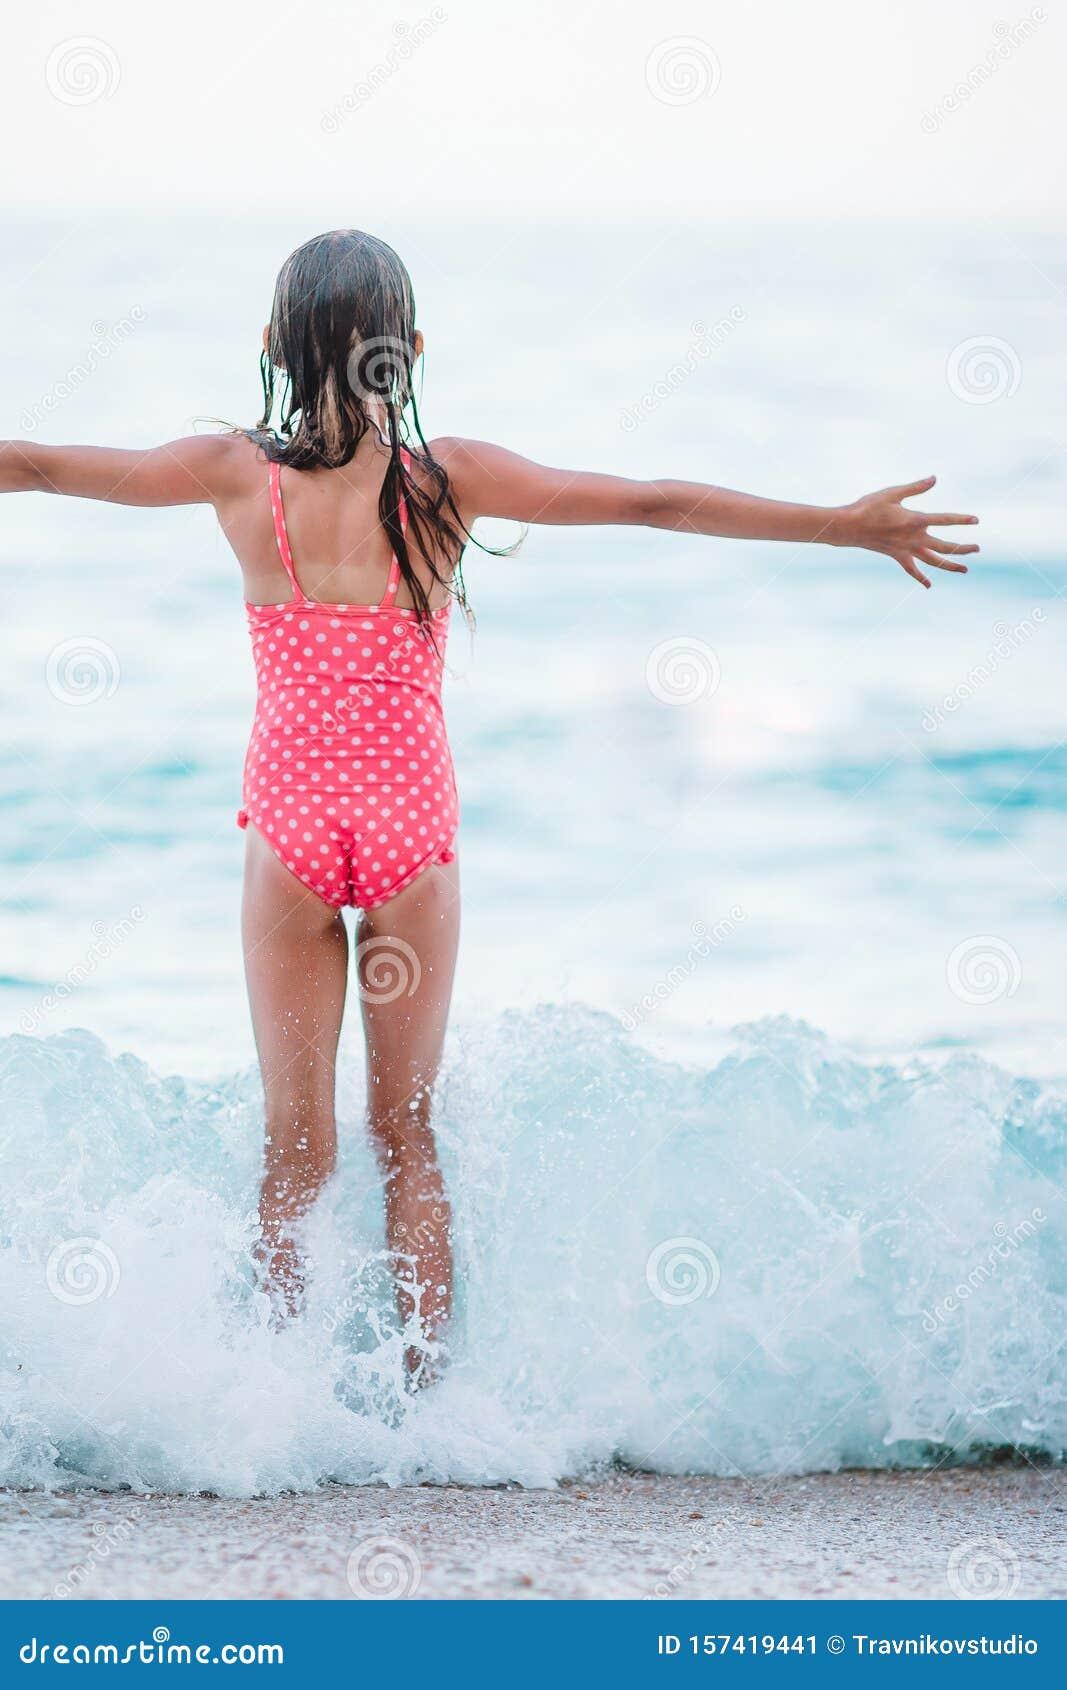 Free Images : beach, sea, sand, ocean, girl, woman, jump